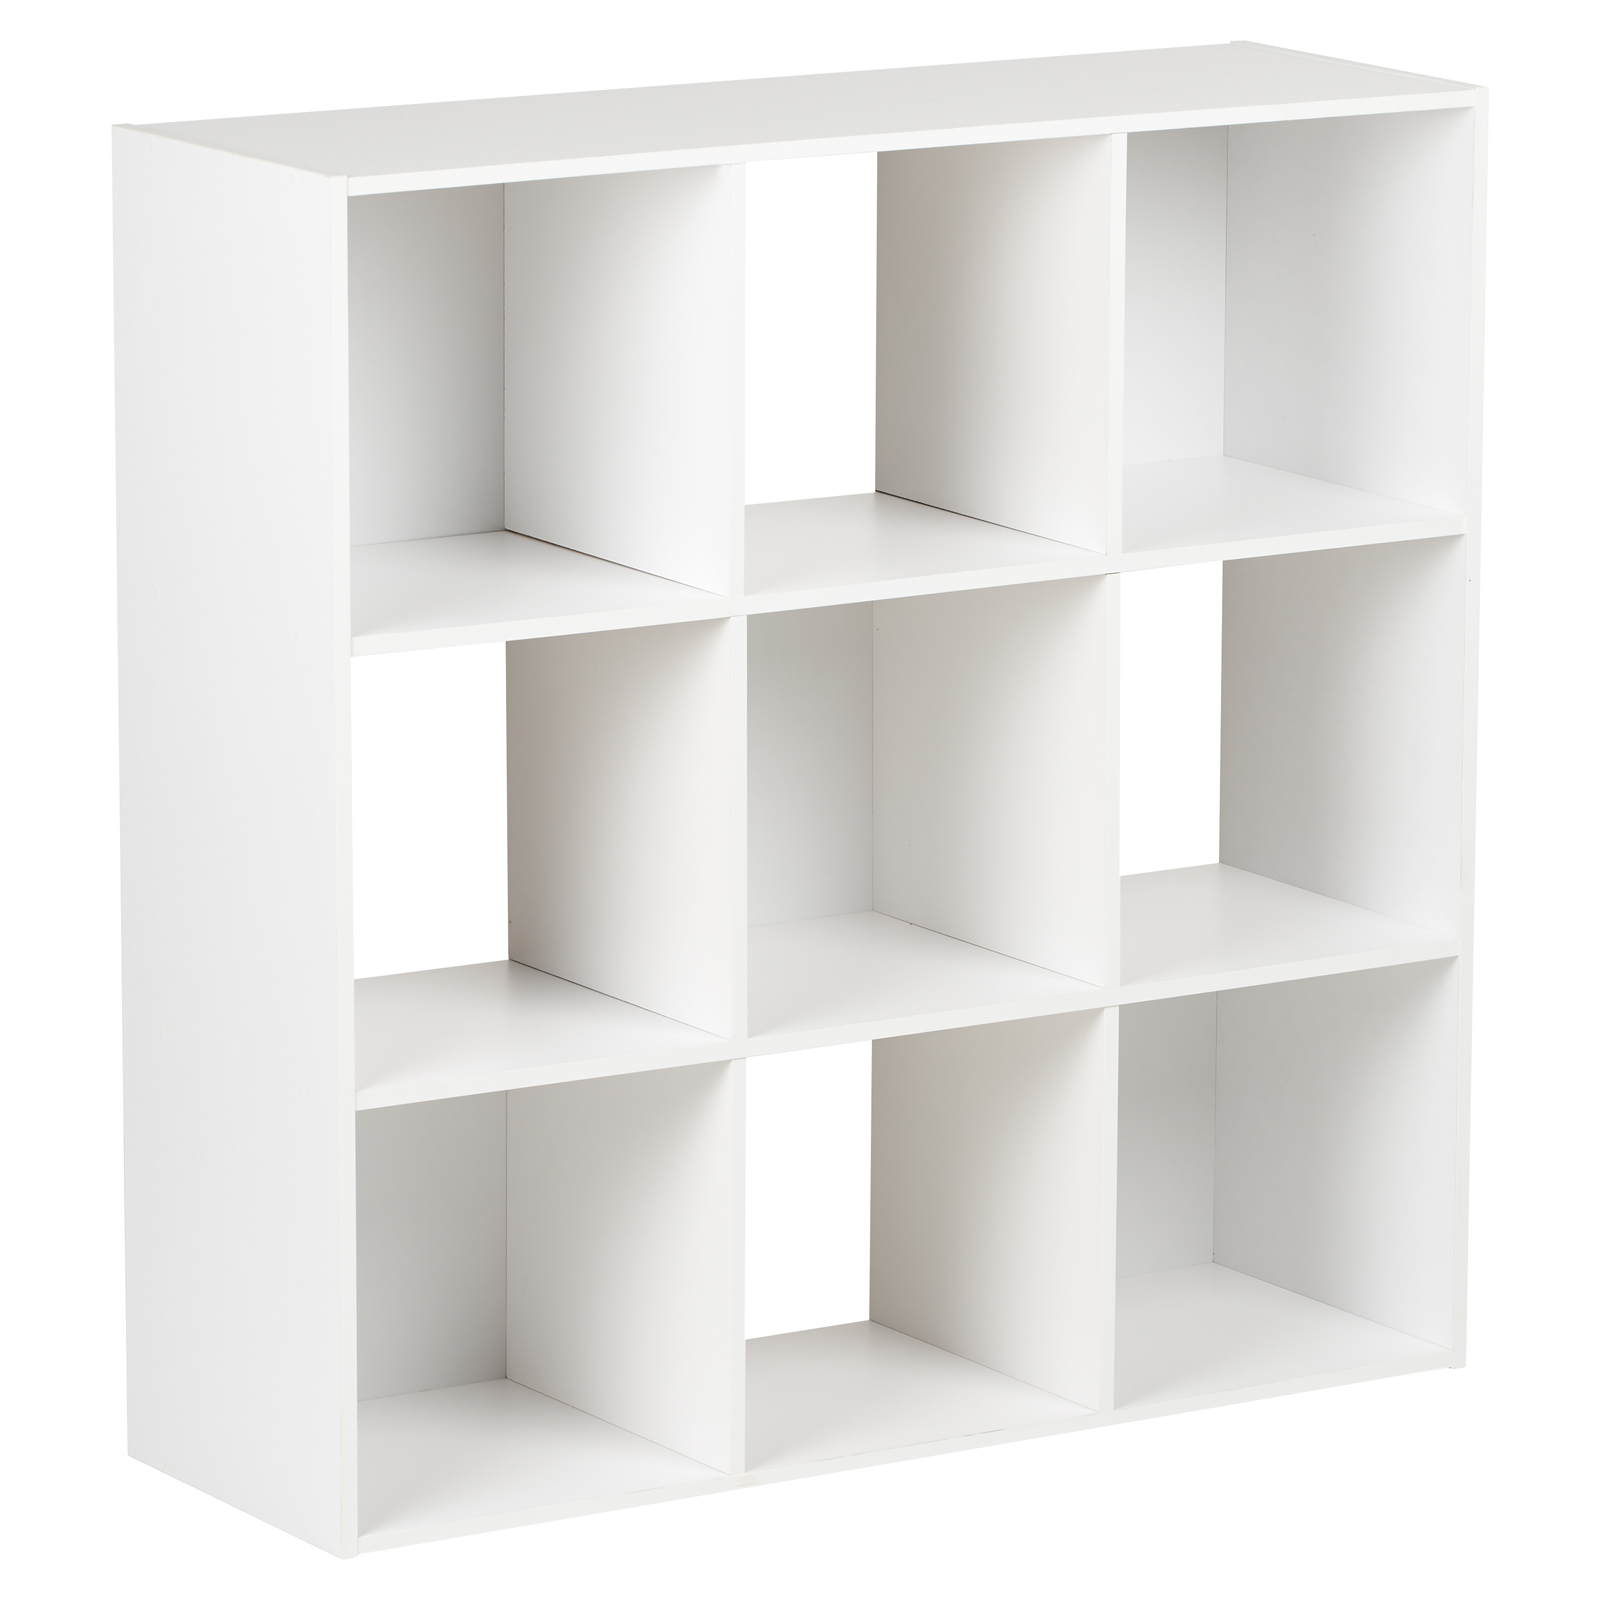 Hartleys White 9 Cube Modular Square Storage Shelving 3